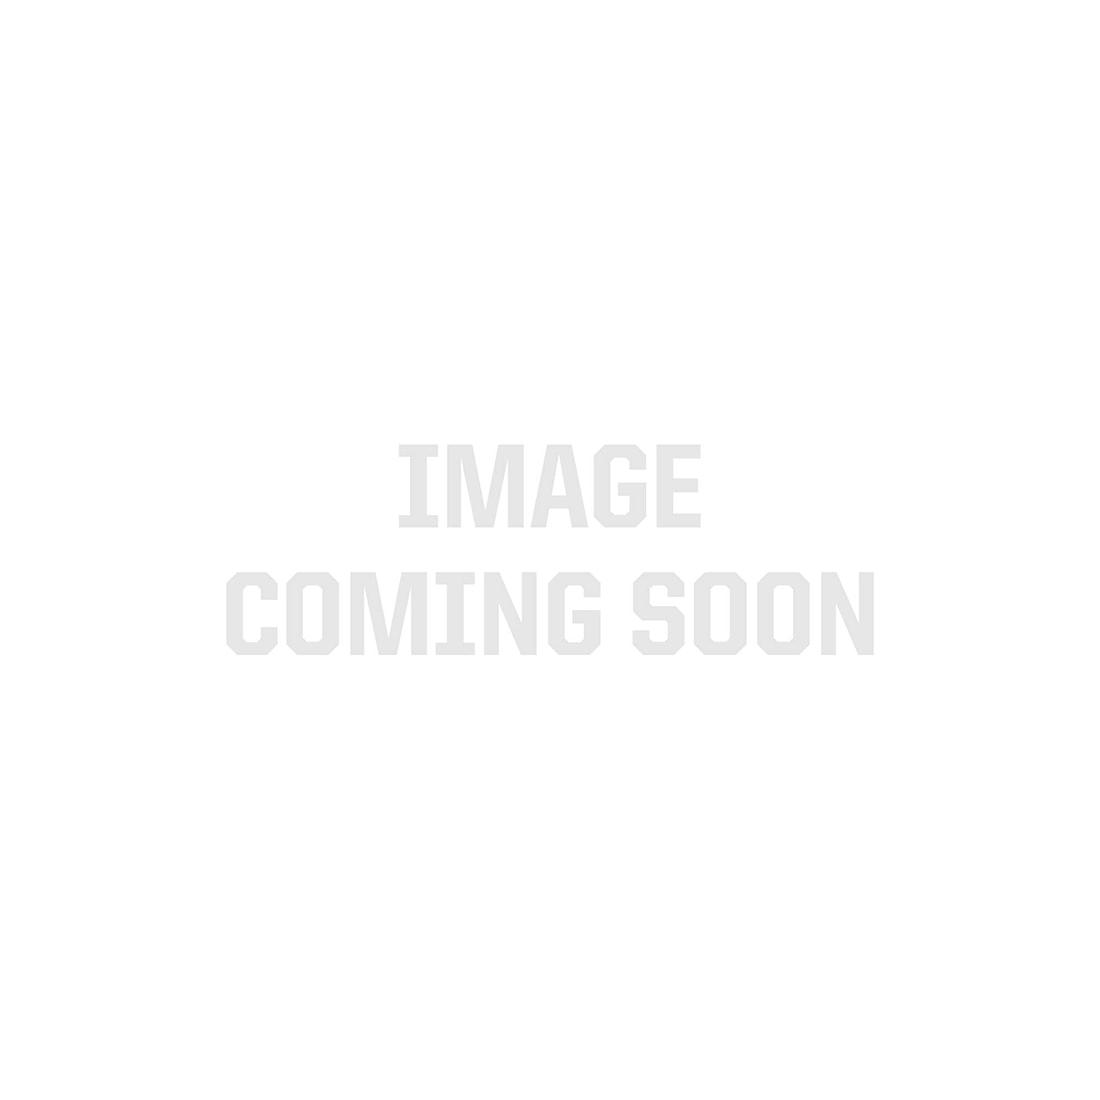 Kichler Design Pro LED Interconnect (9 inches long) (Black) (Optional)